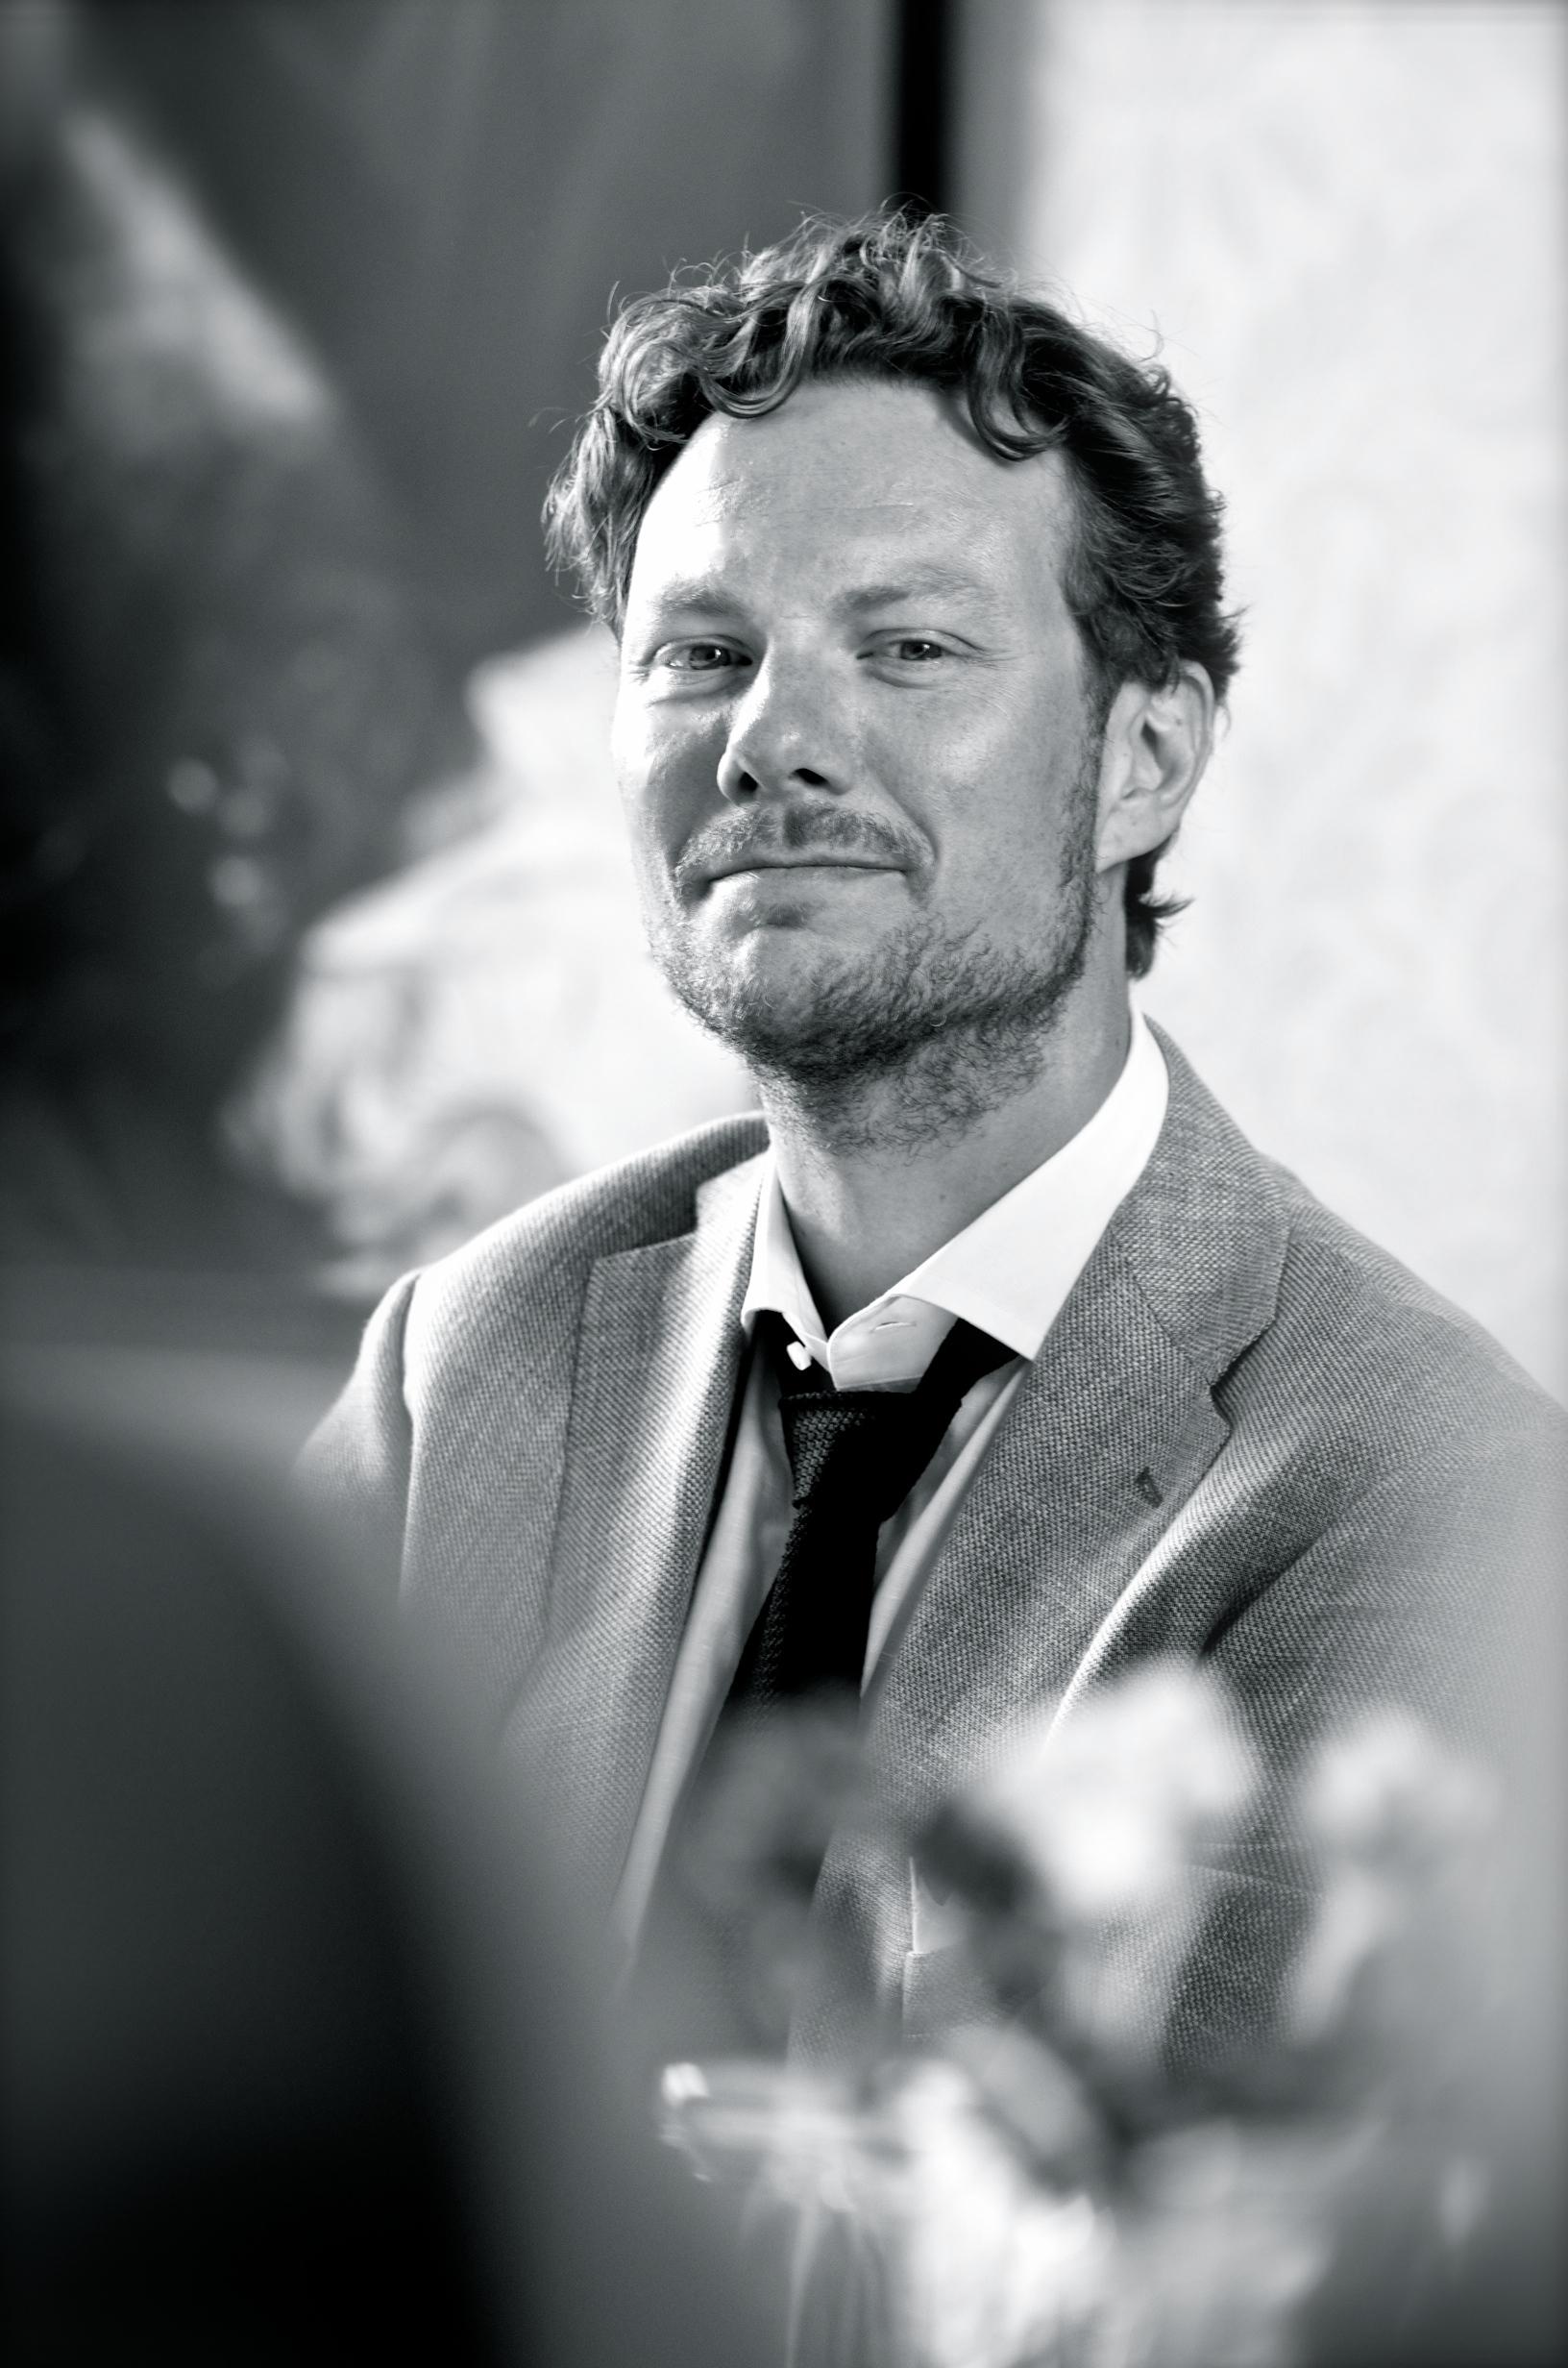 Erik van Schevikhoven